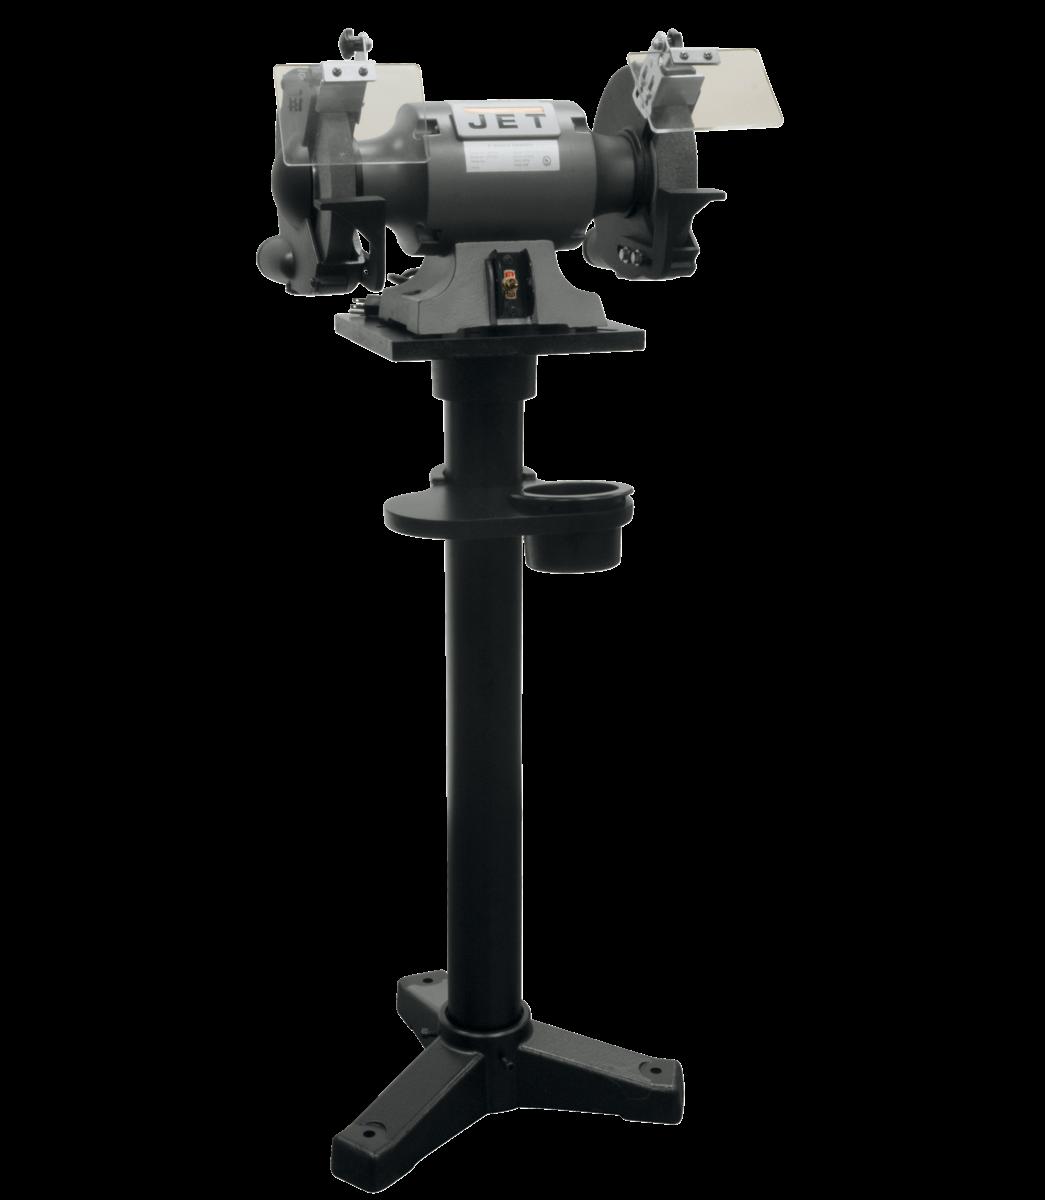 "JBG-10B 10"" SHPGRNDR&JPS-2A STND"